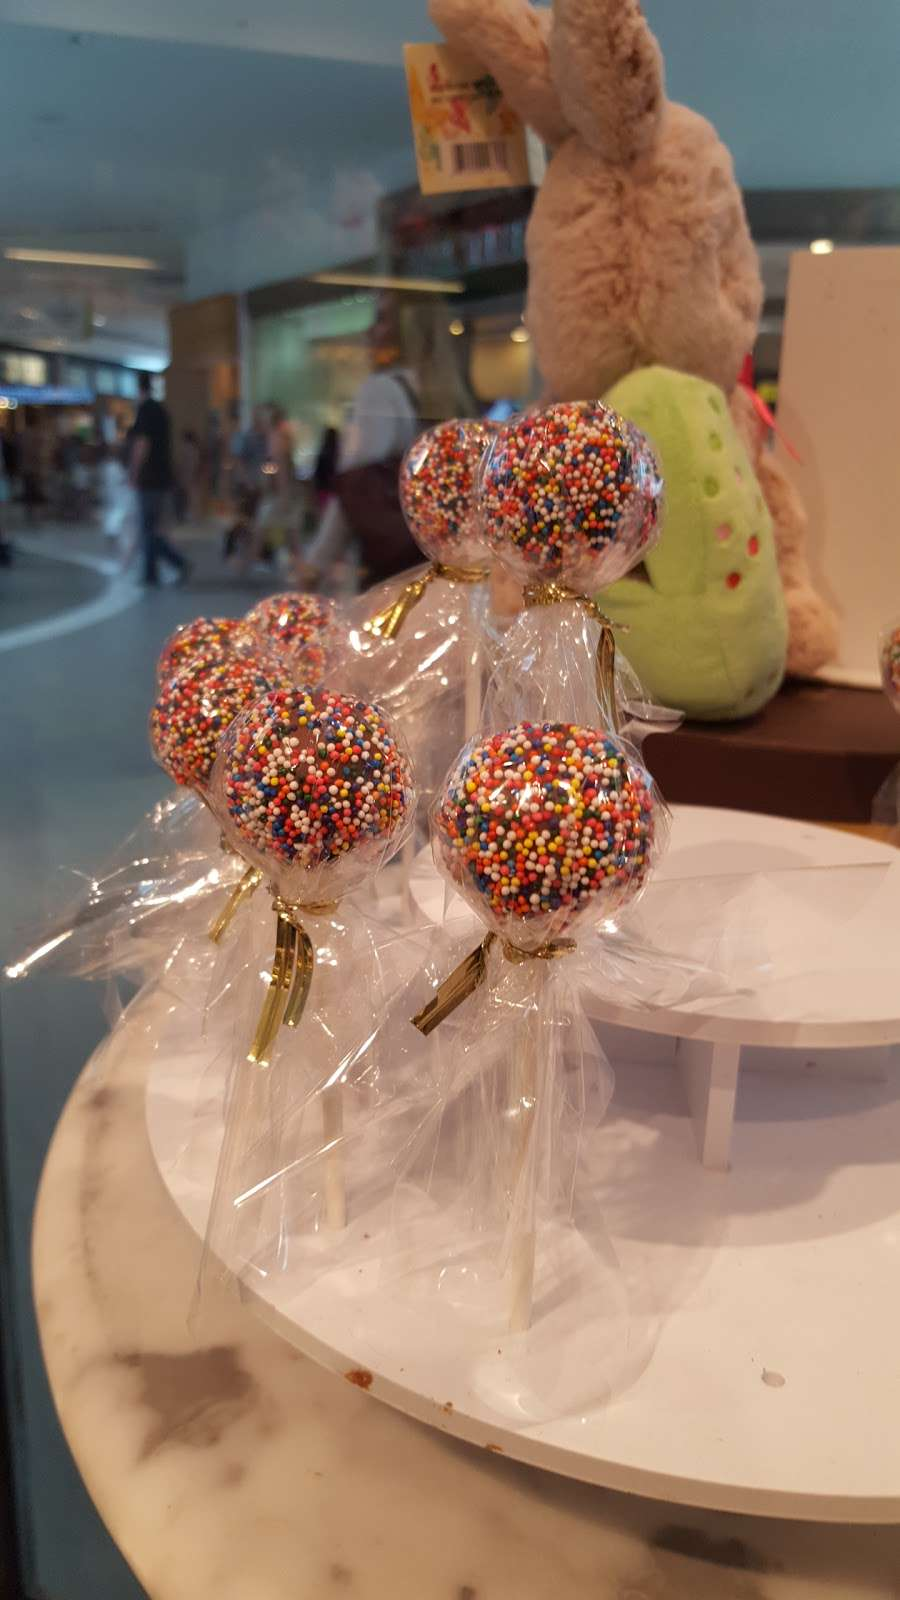 Godiva Chocolatier - store    Photo 9 of 10   Address: 8001 S Orange Blossom Trail, Orlando, FL 32809, USA   Phone: (407) 857-5549